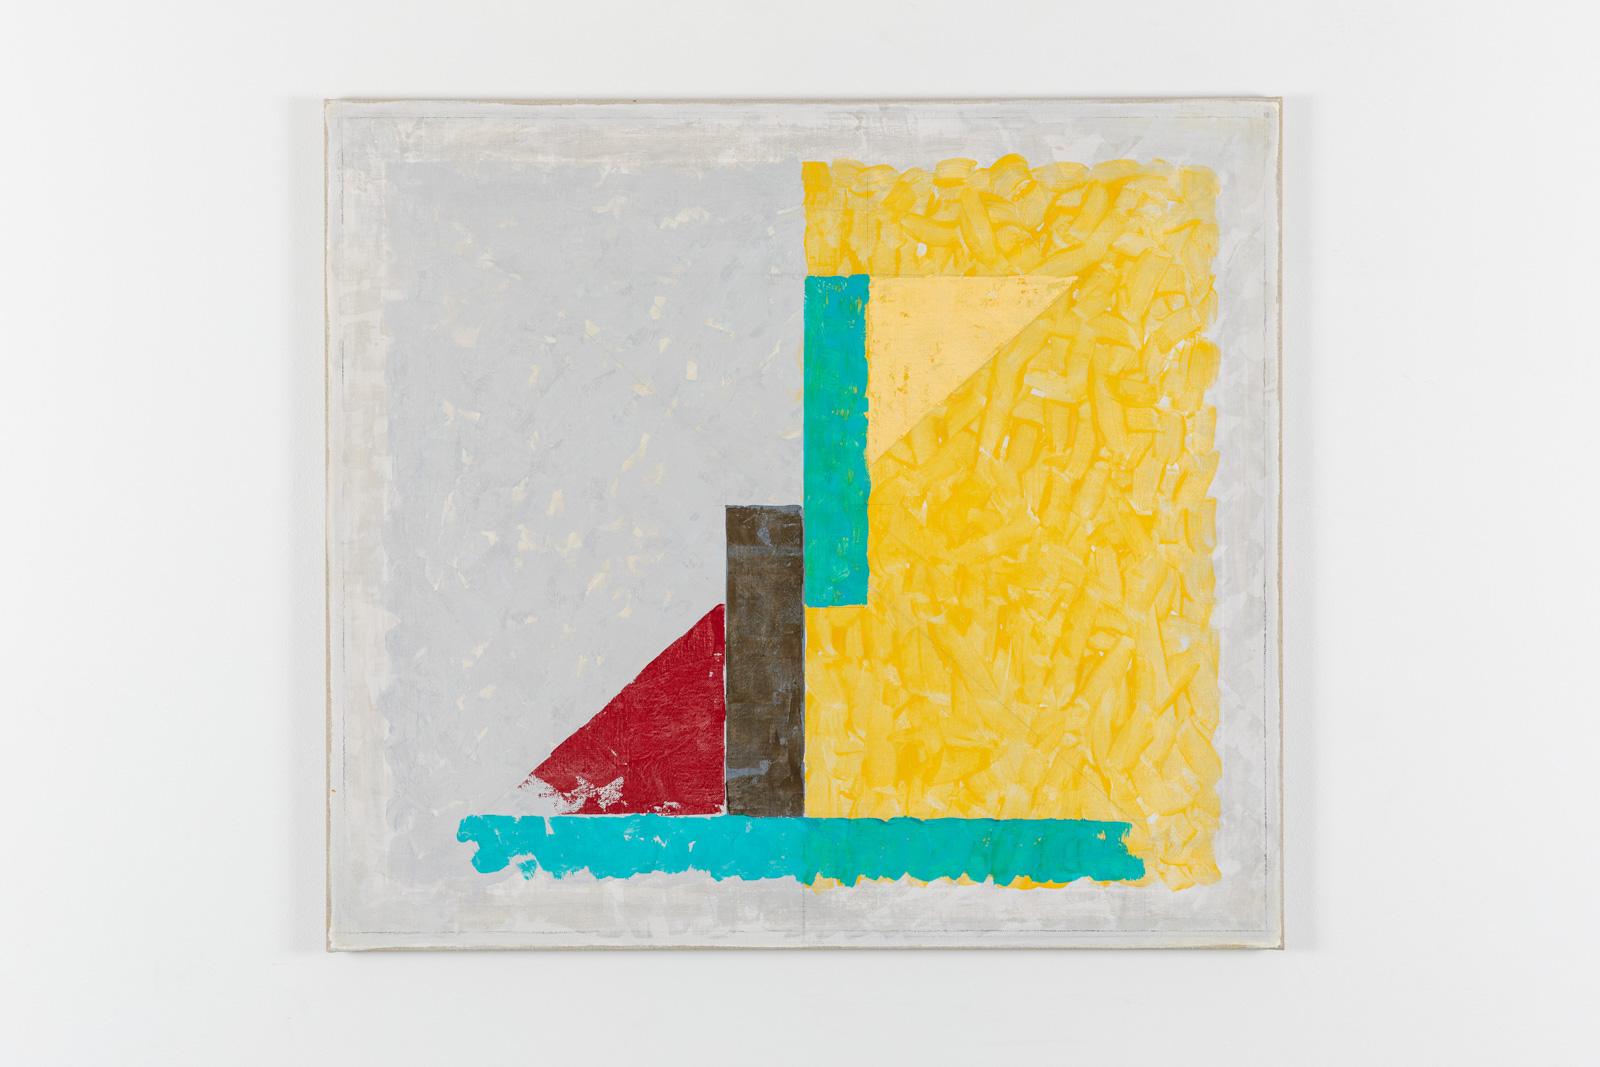 Vila Ziza 24, 2018, Egg tempera on canvas, 80 x 90 cm